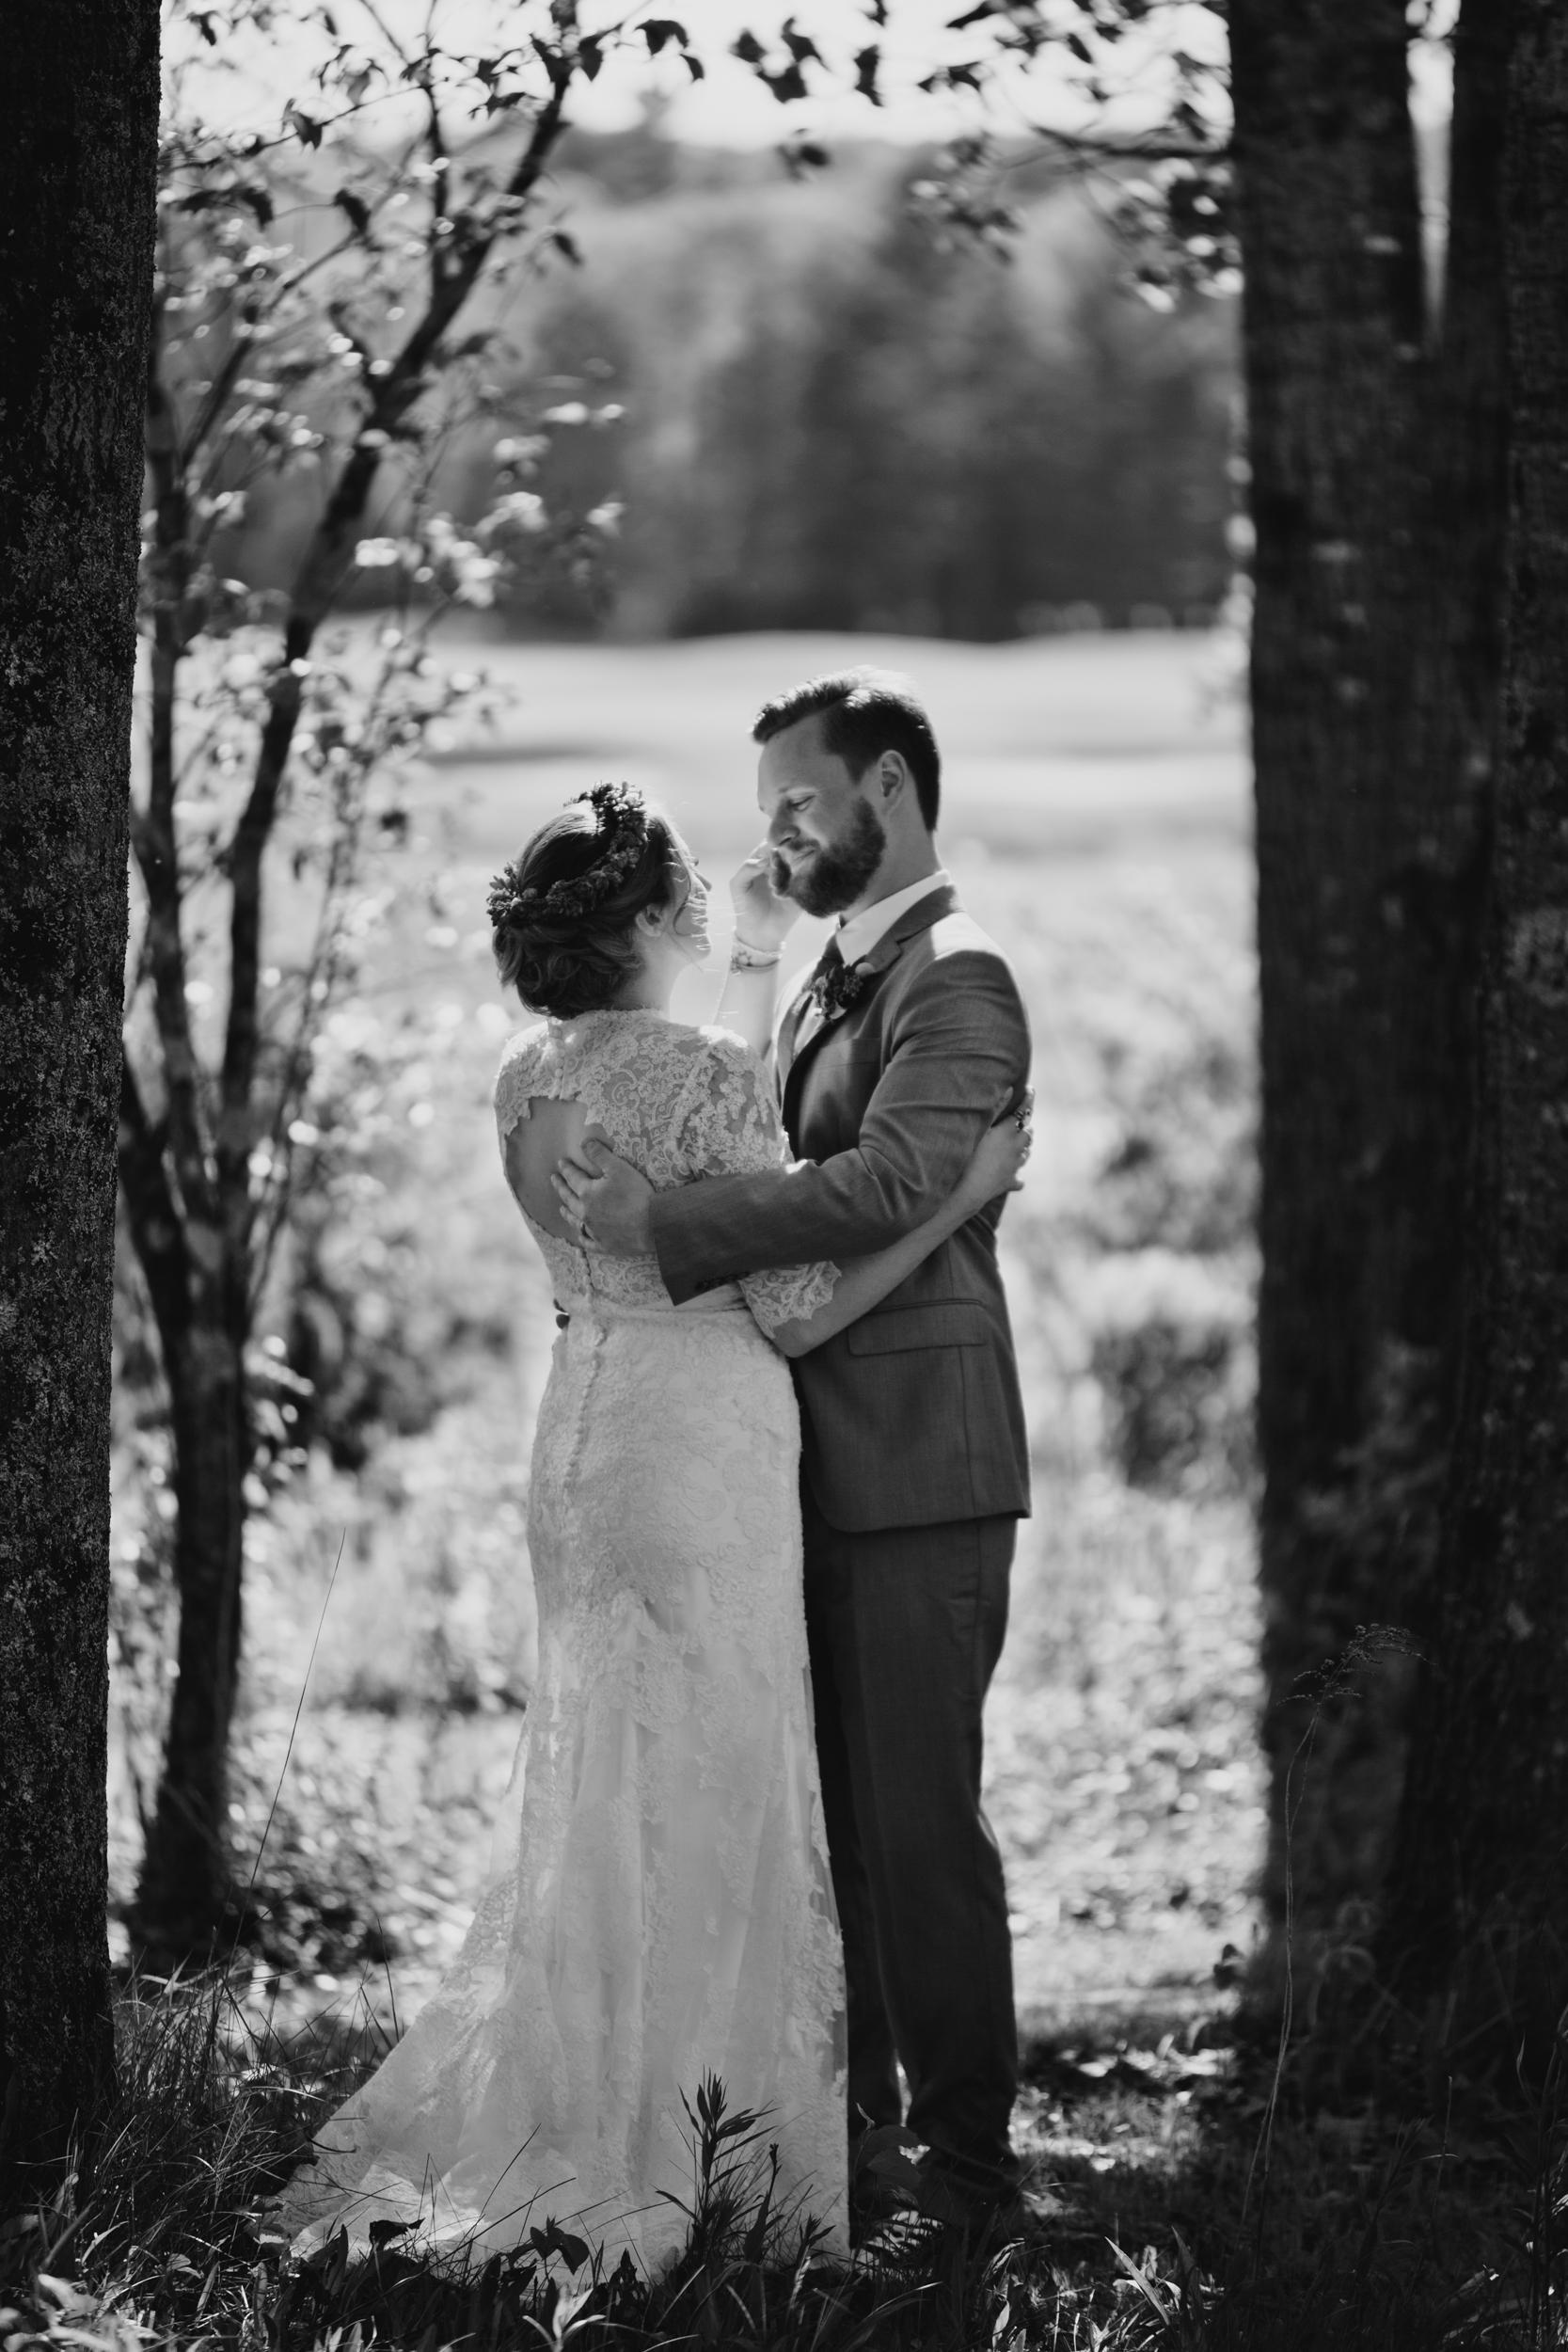 Spring-Meadows-Maine-Wedding-136.jpg